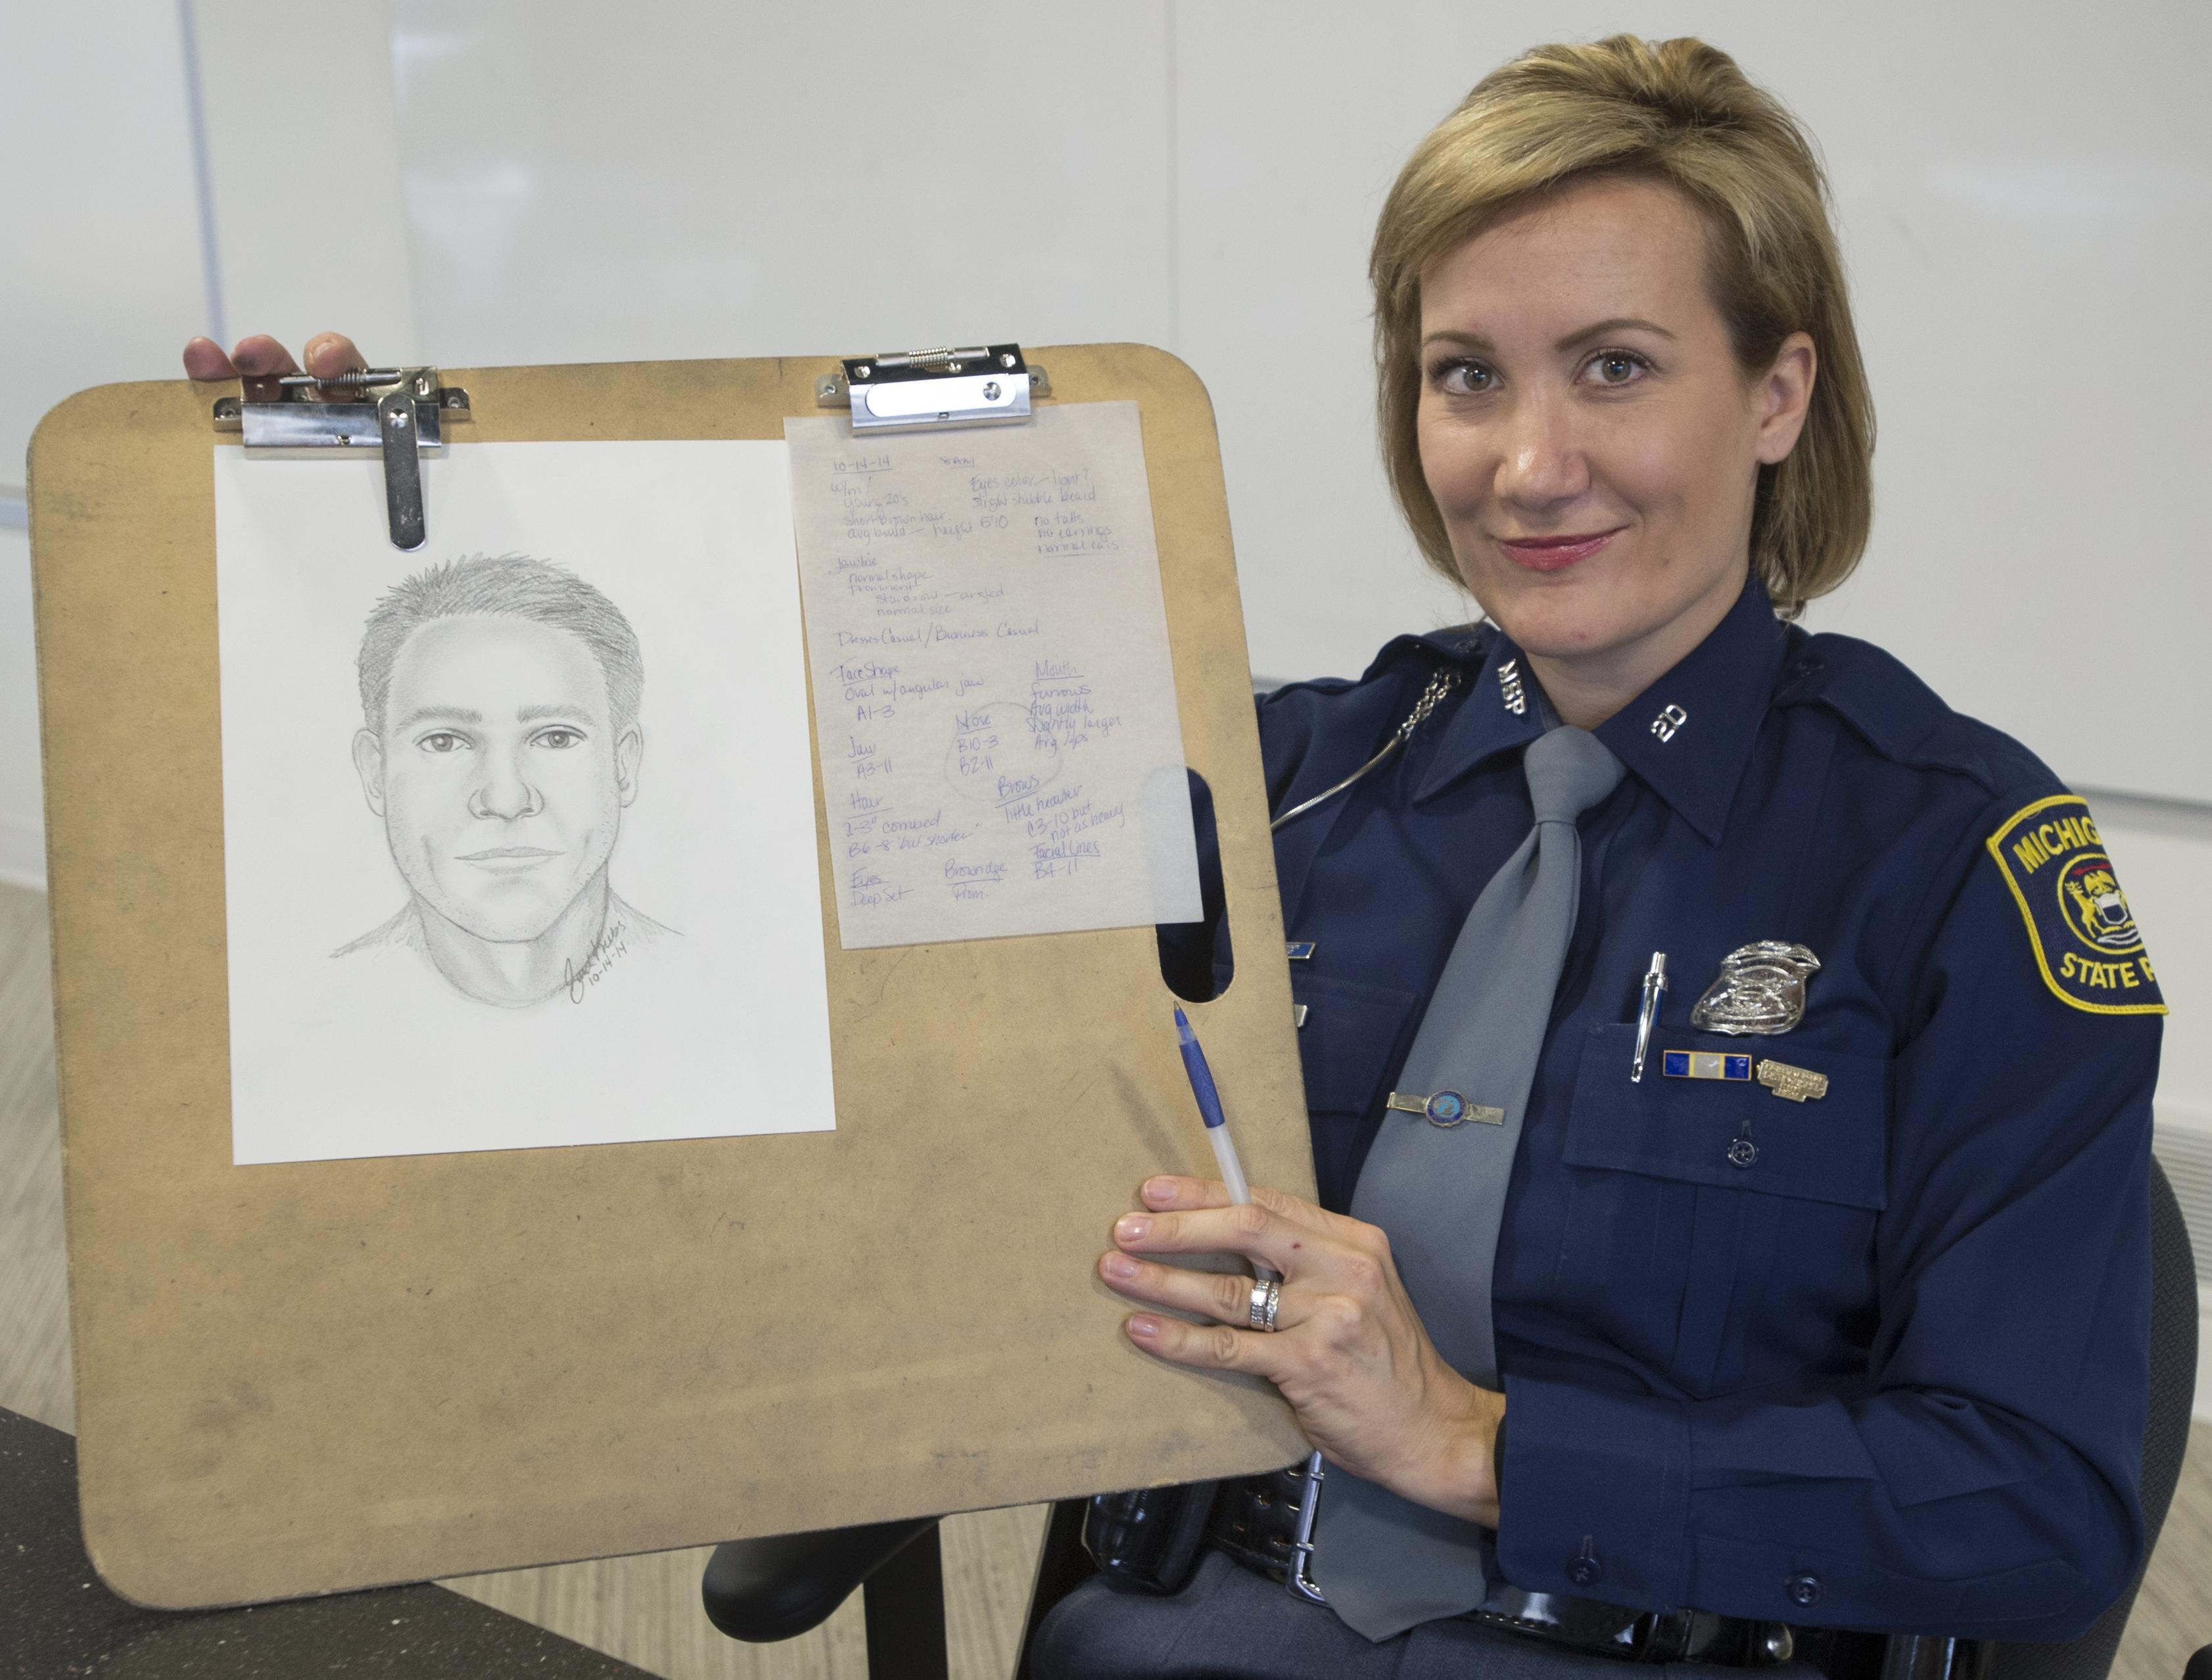 Saginaw Police use sketch artists to make arrests - Washington Times